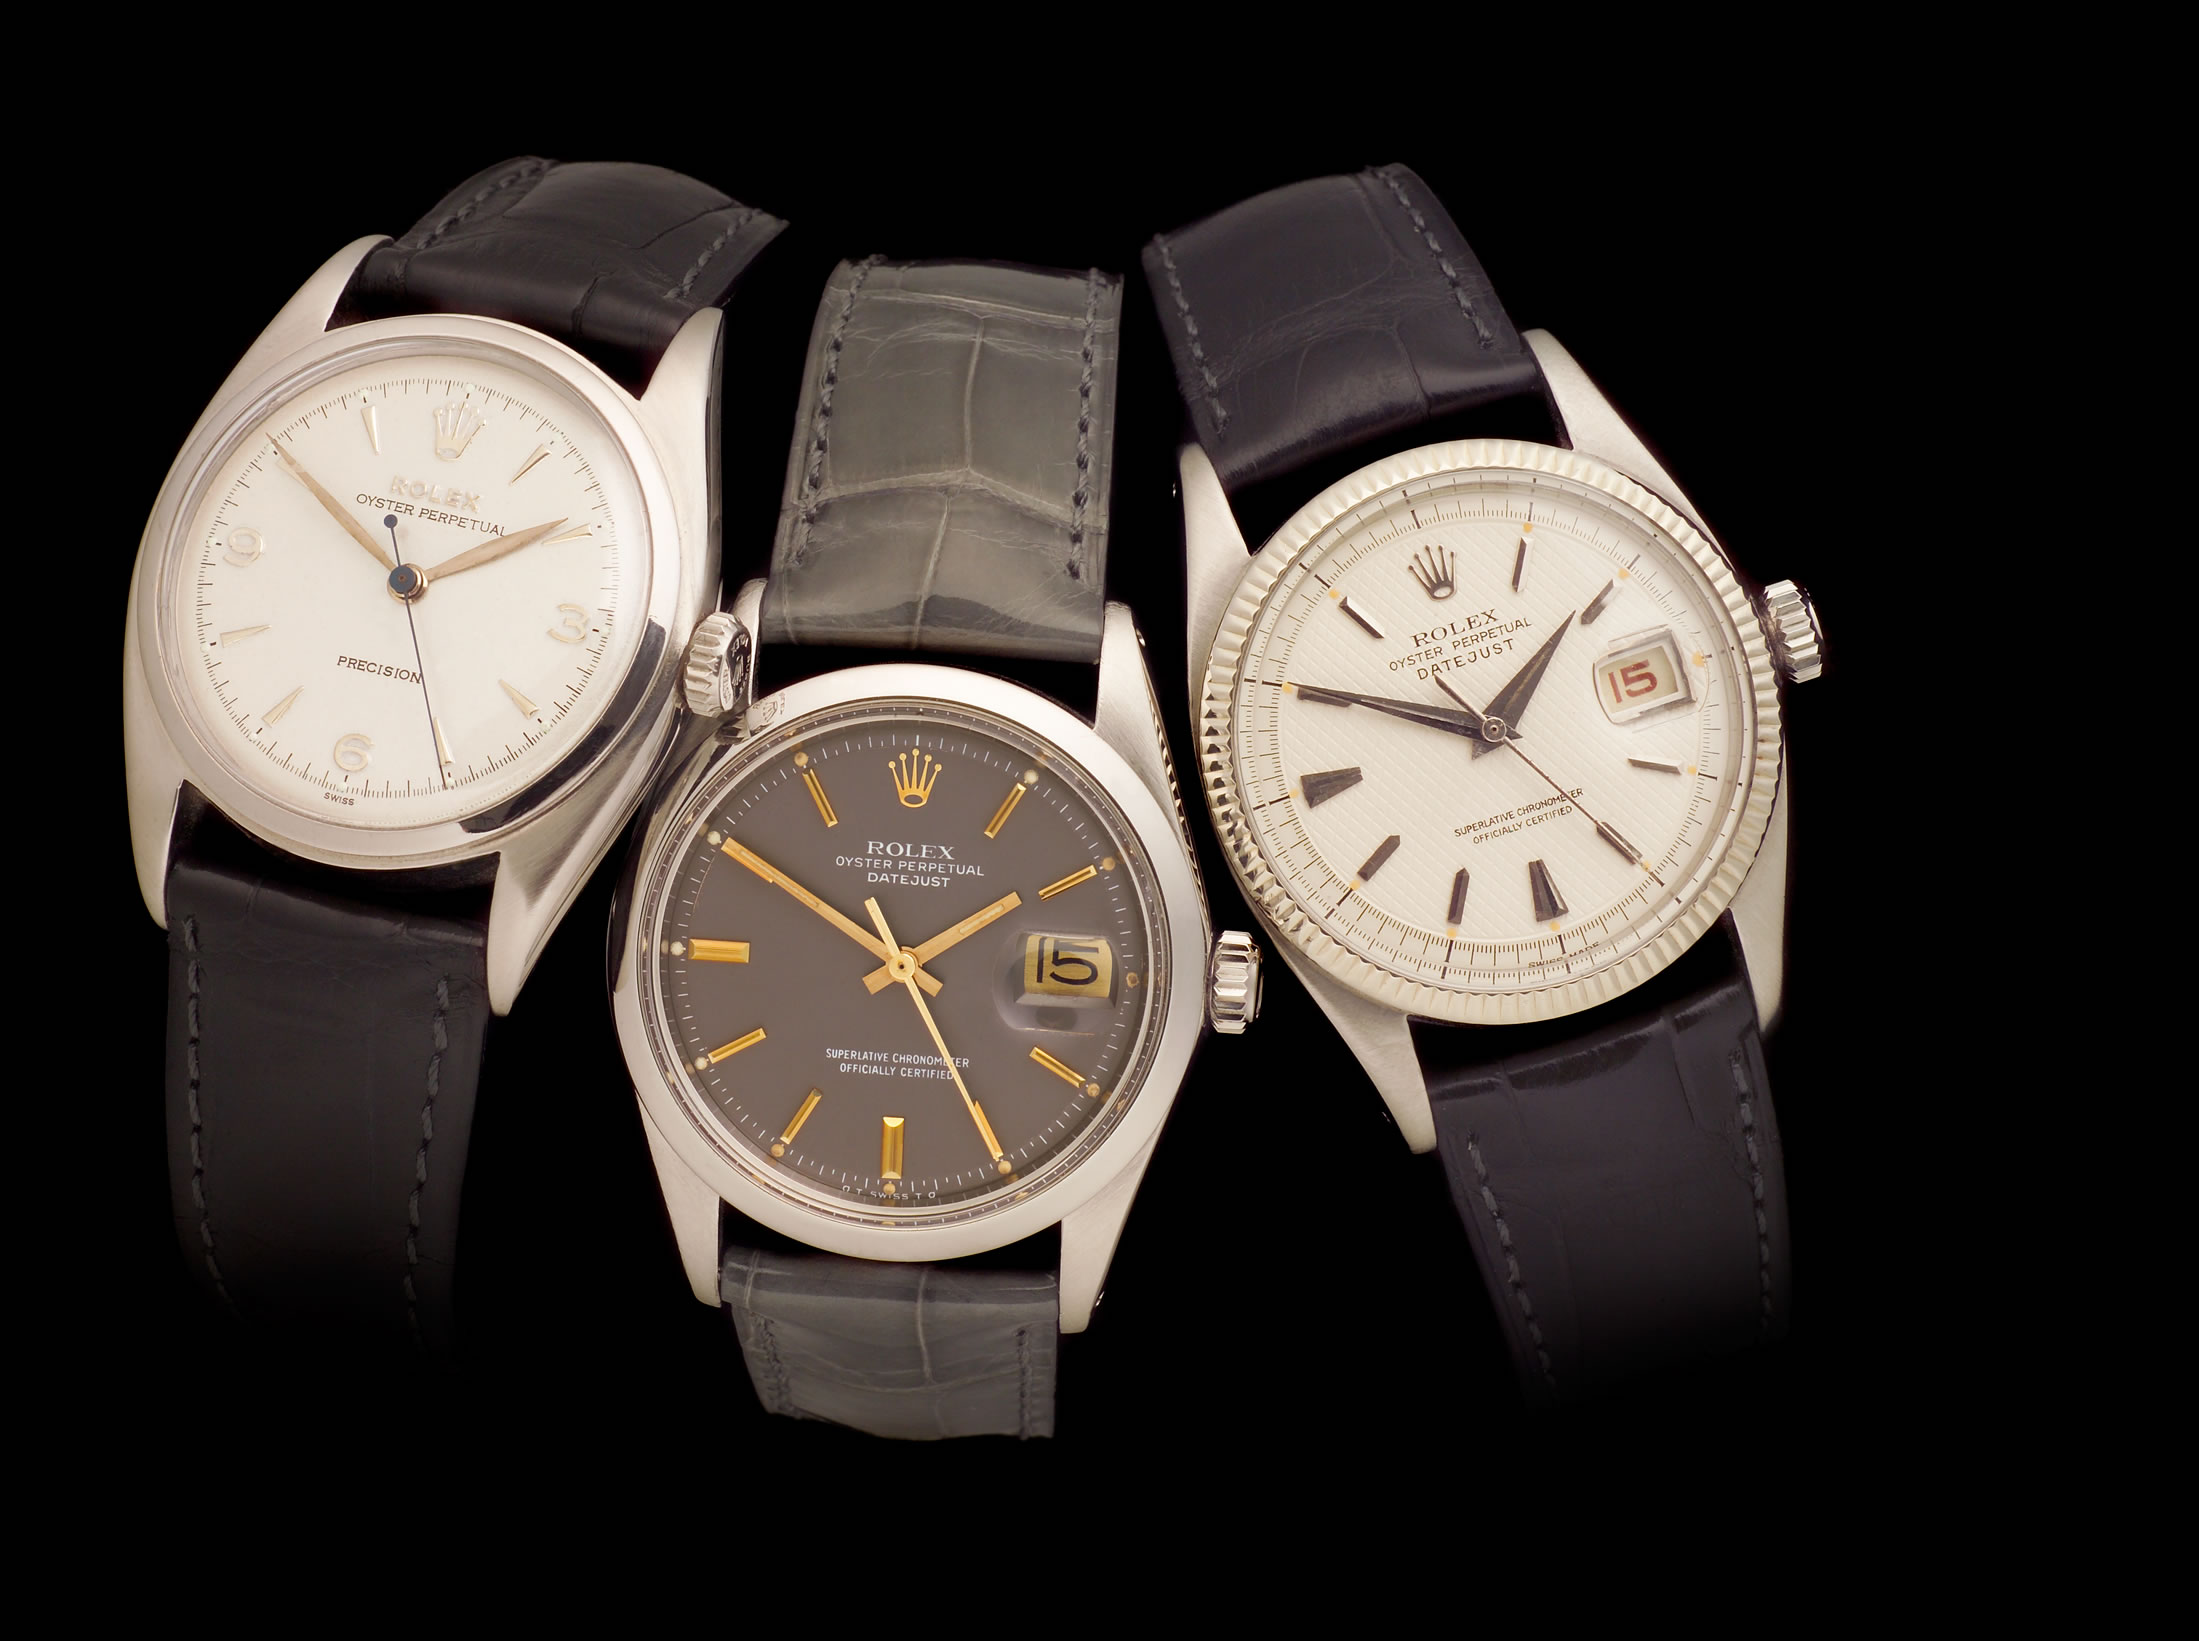 Orologi usati milano